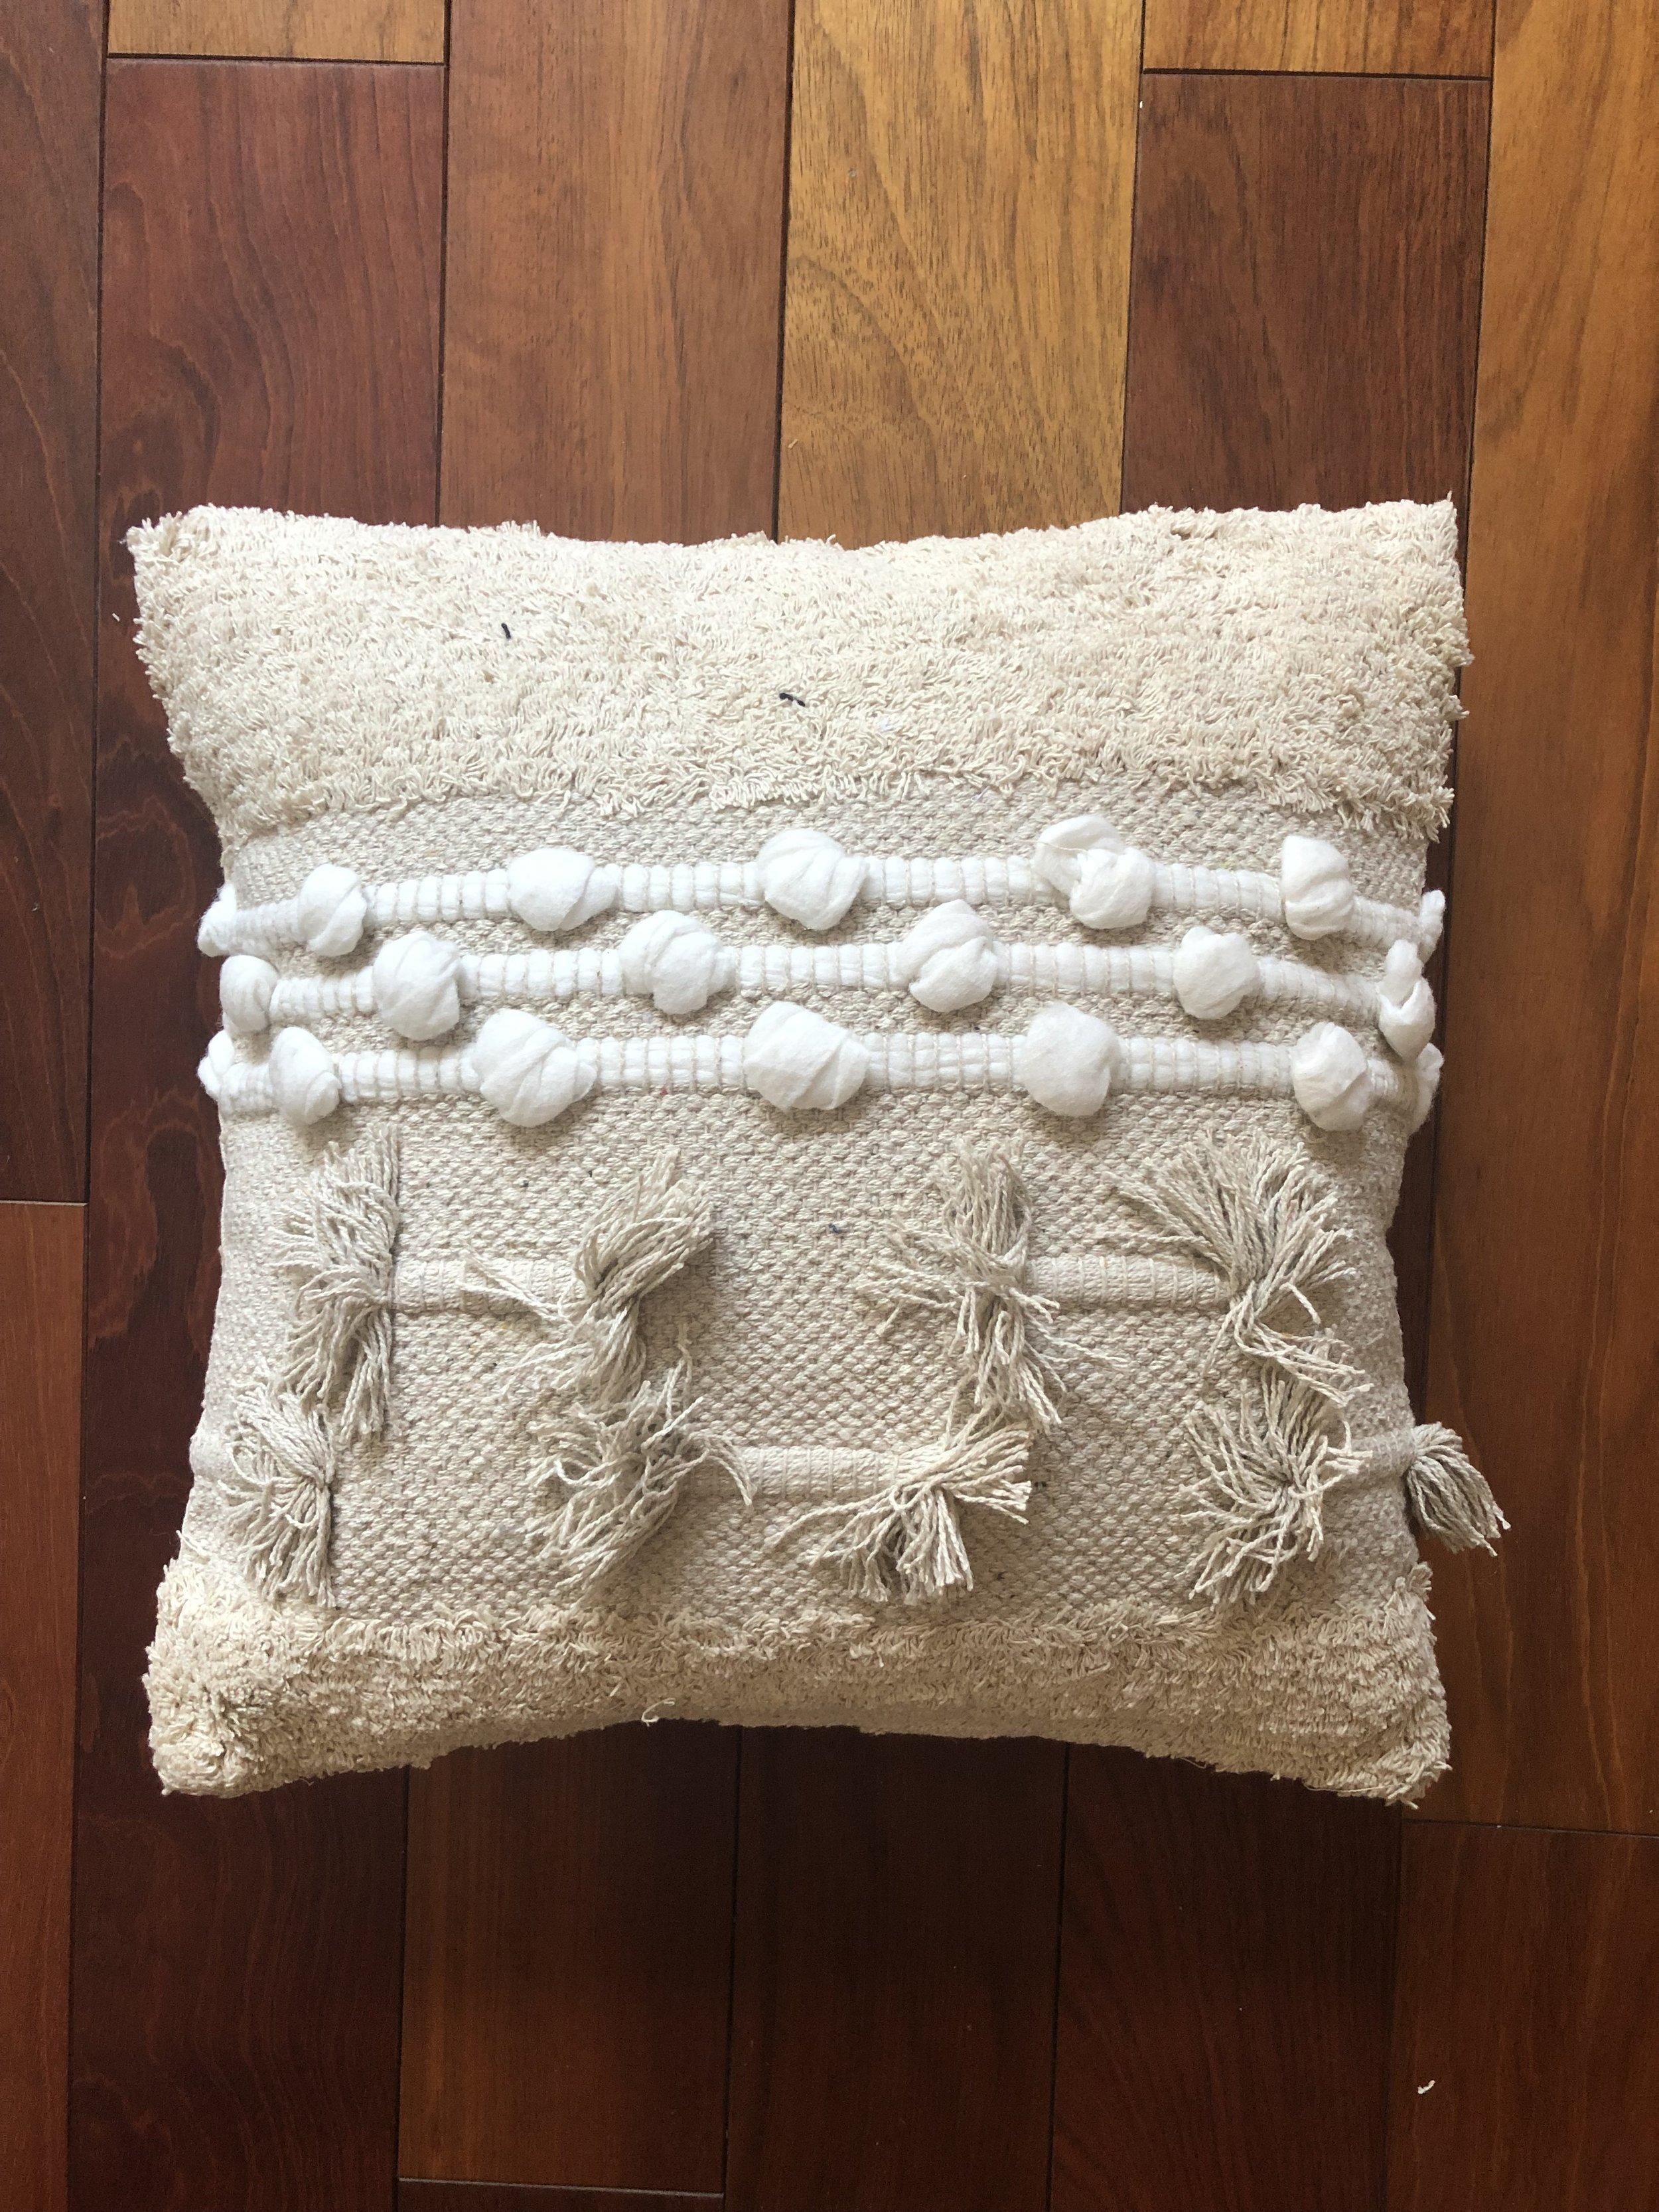 Boho Pillow Tijii /#046 / $10